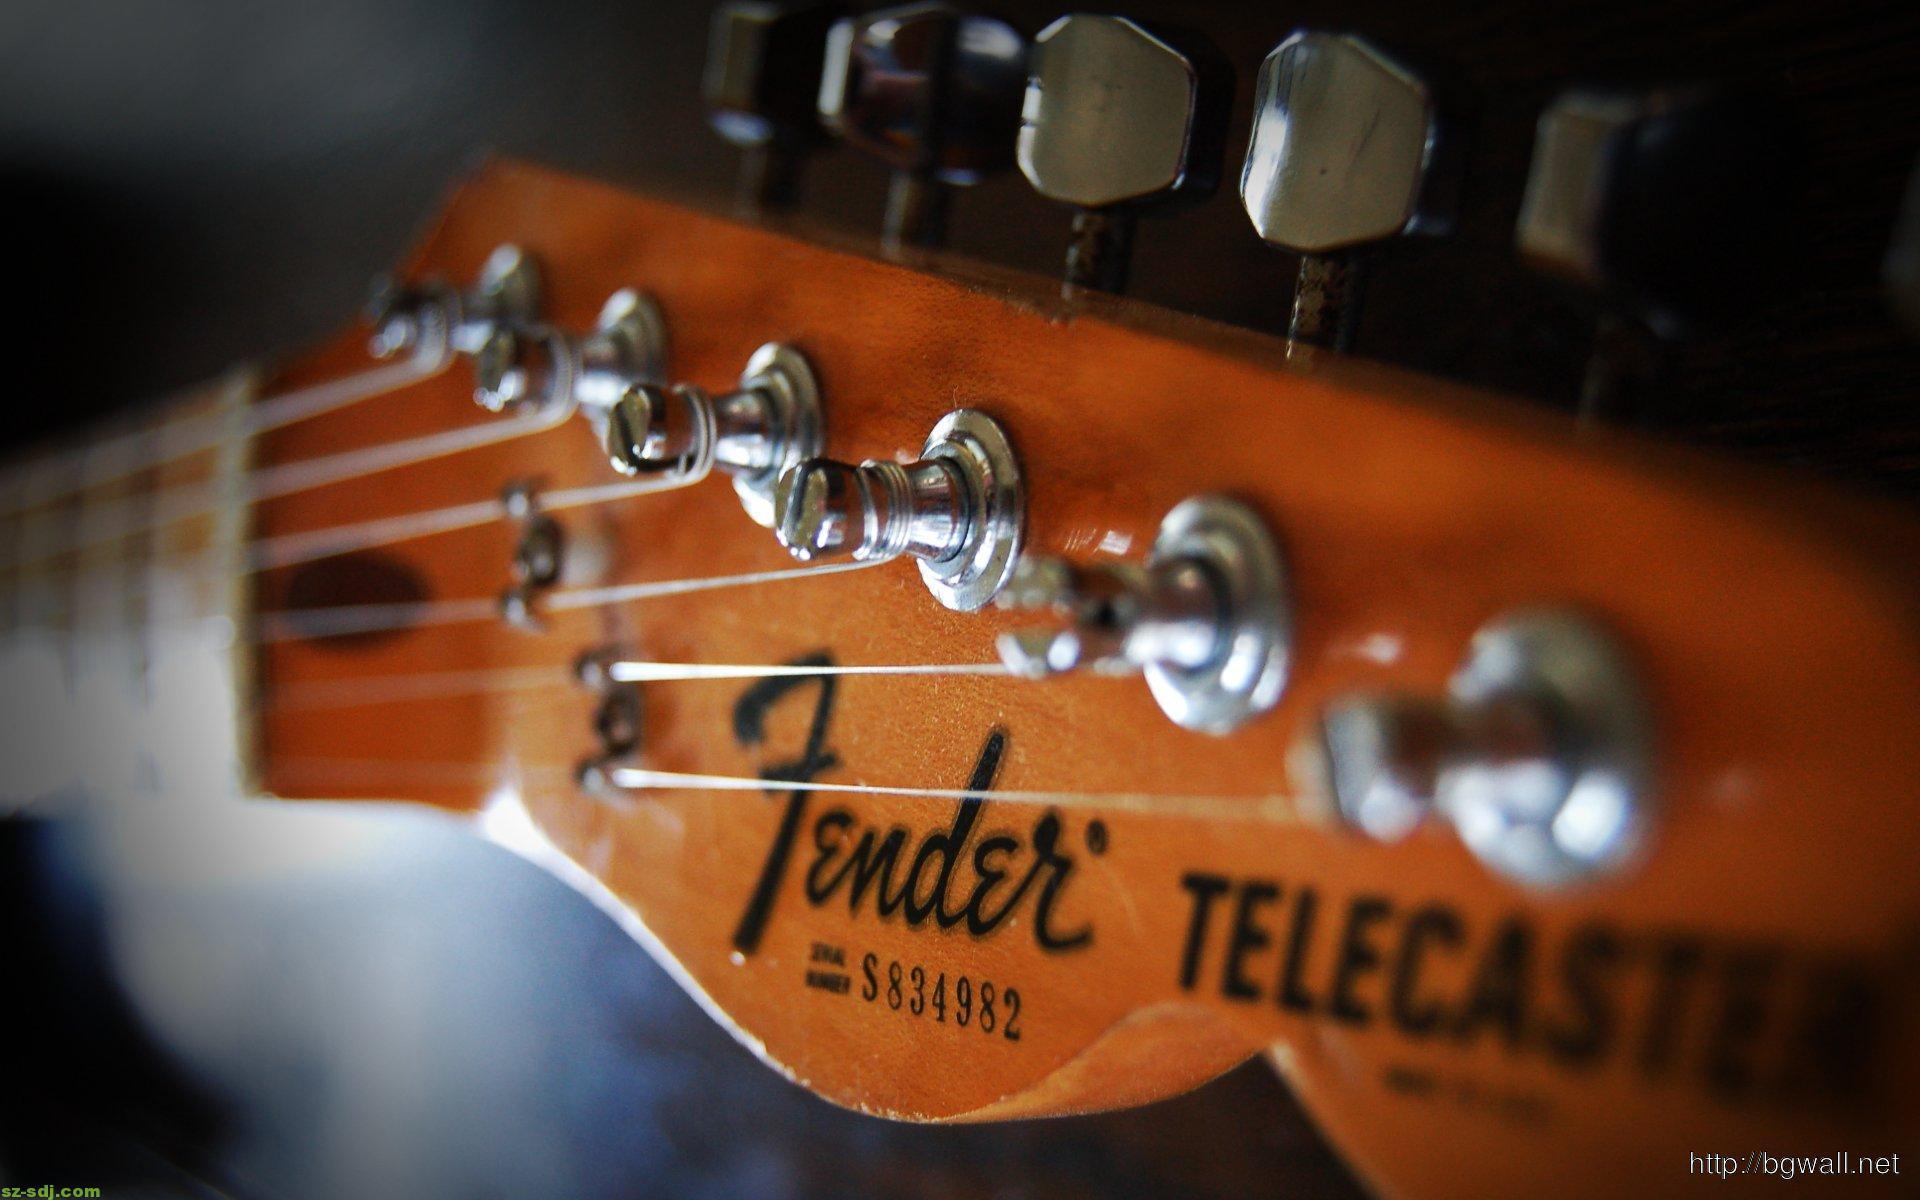 Fender Telecaster Wallpaper Widescreen Desktop